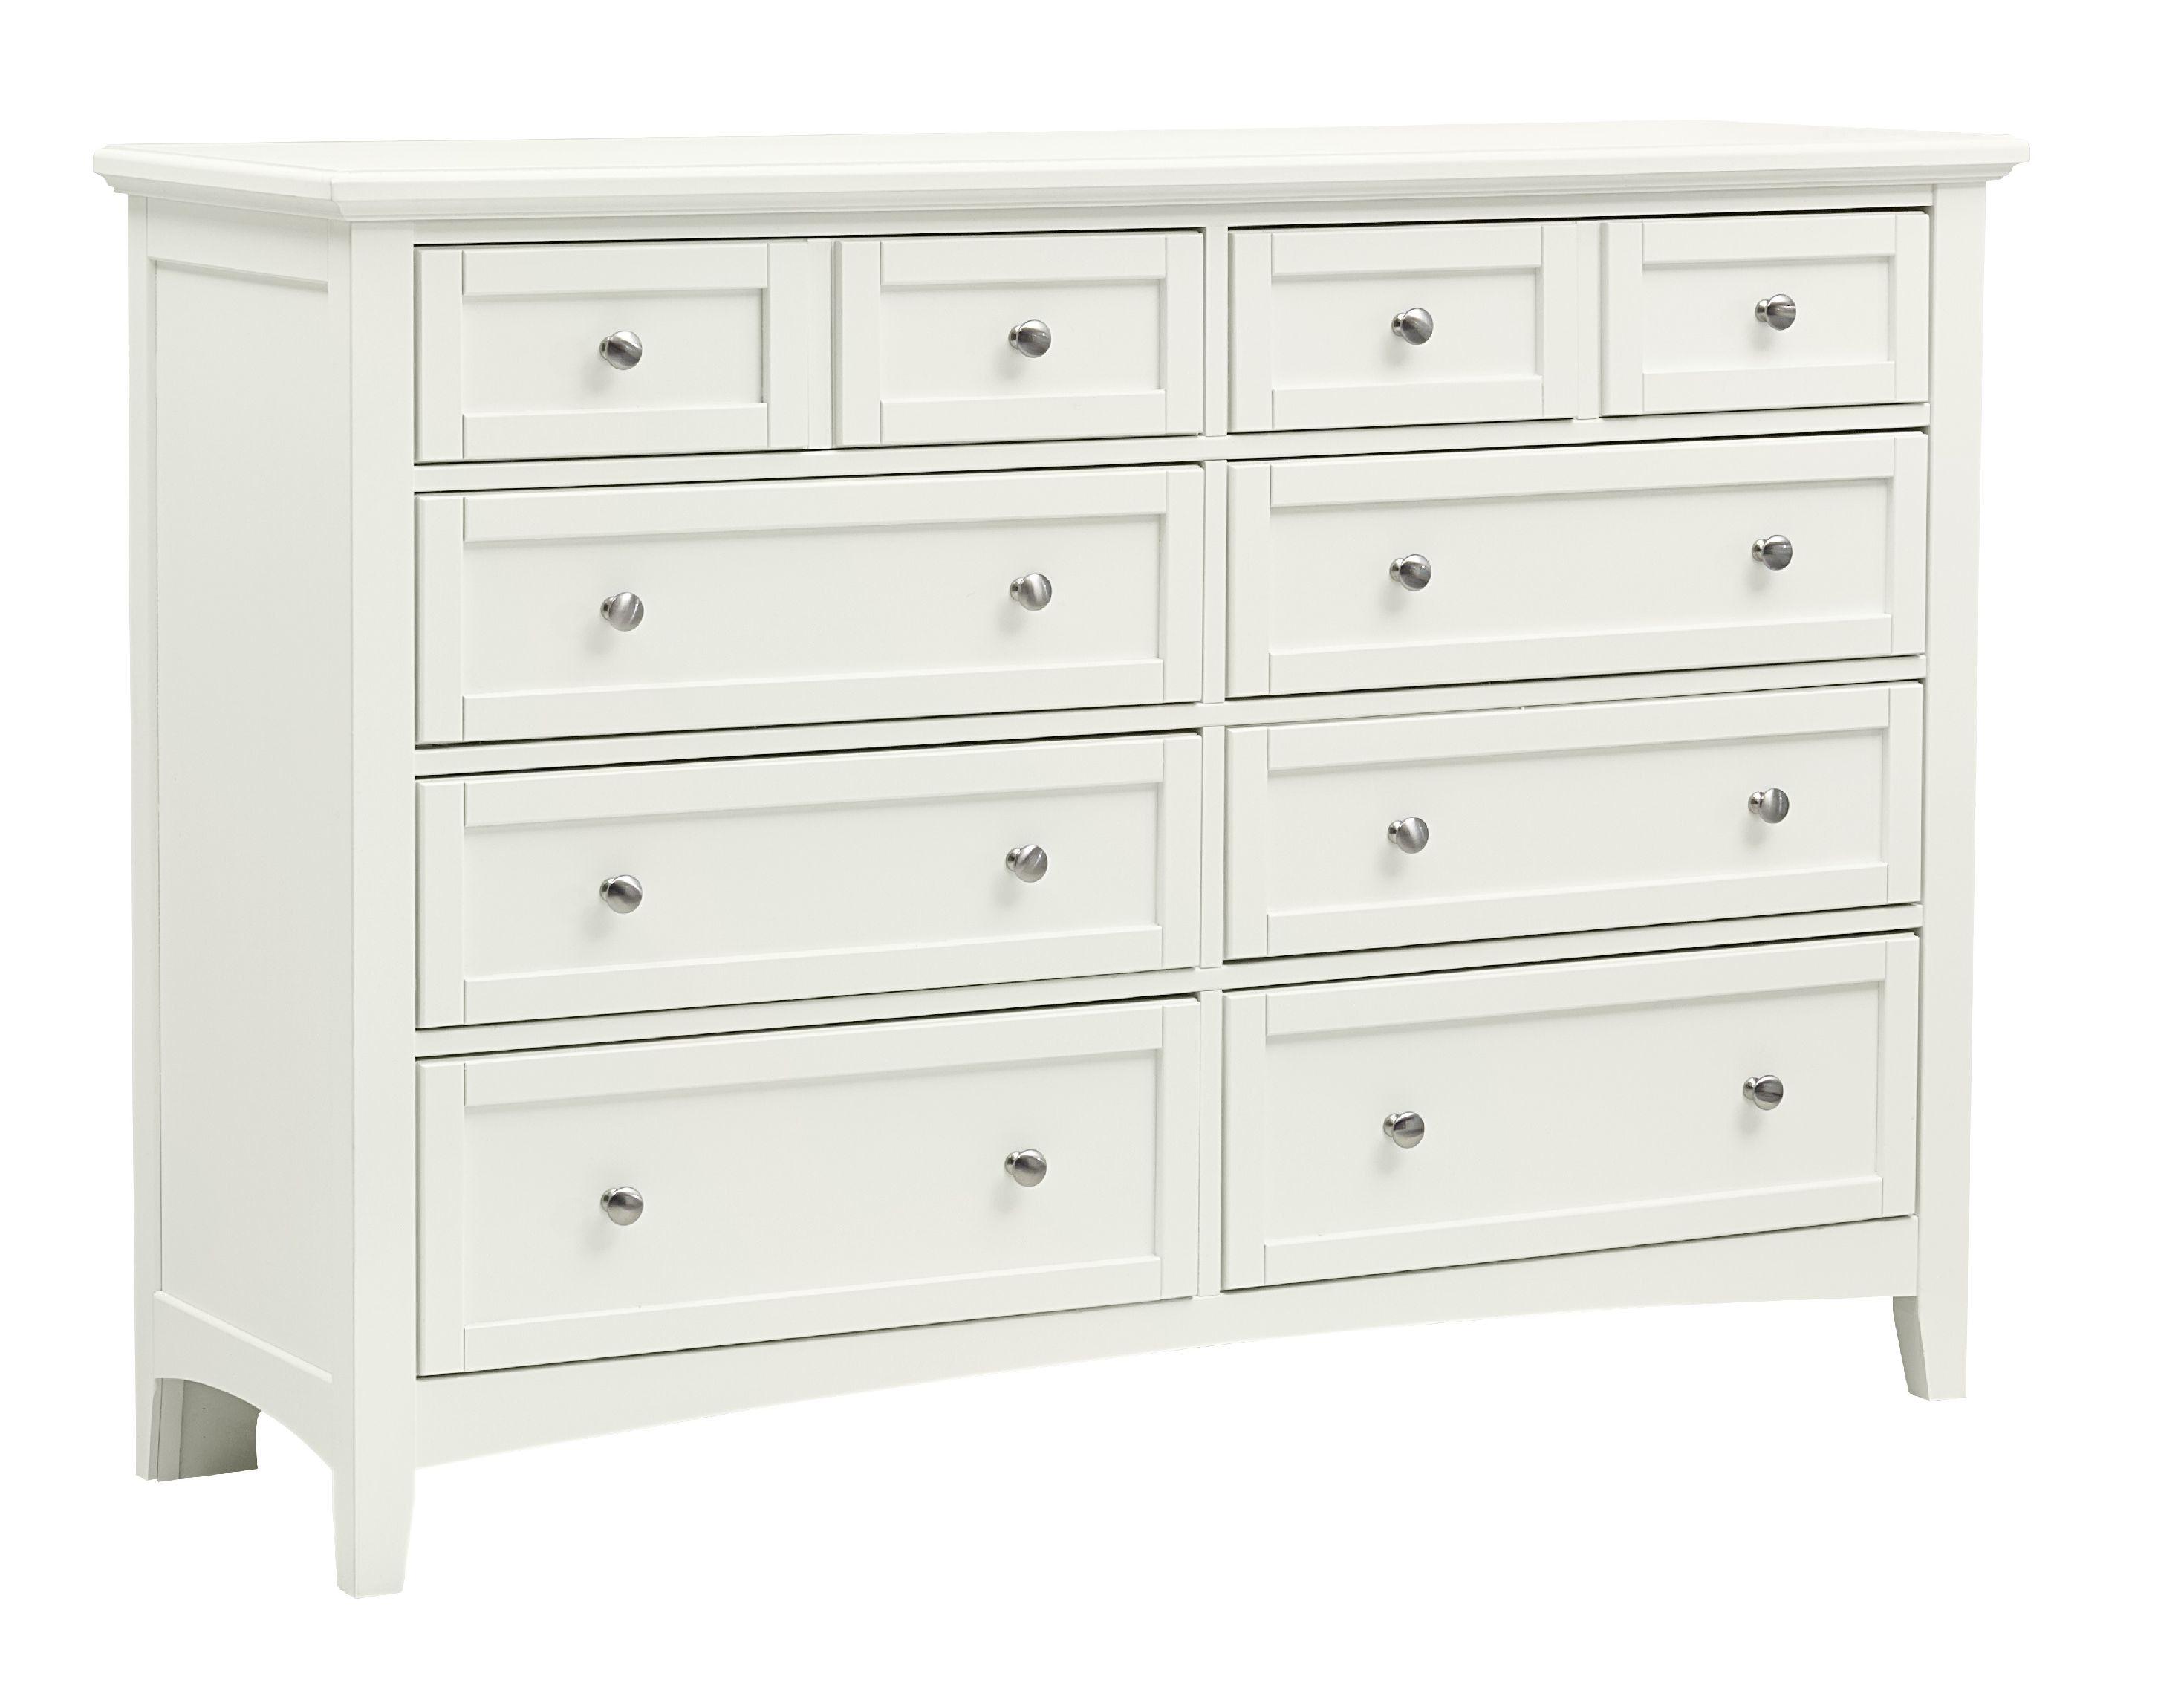 Etonnant Vaughan Bassett Furniture Company Triple Dresser BB29 002